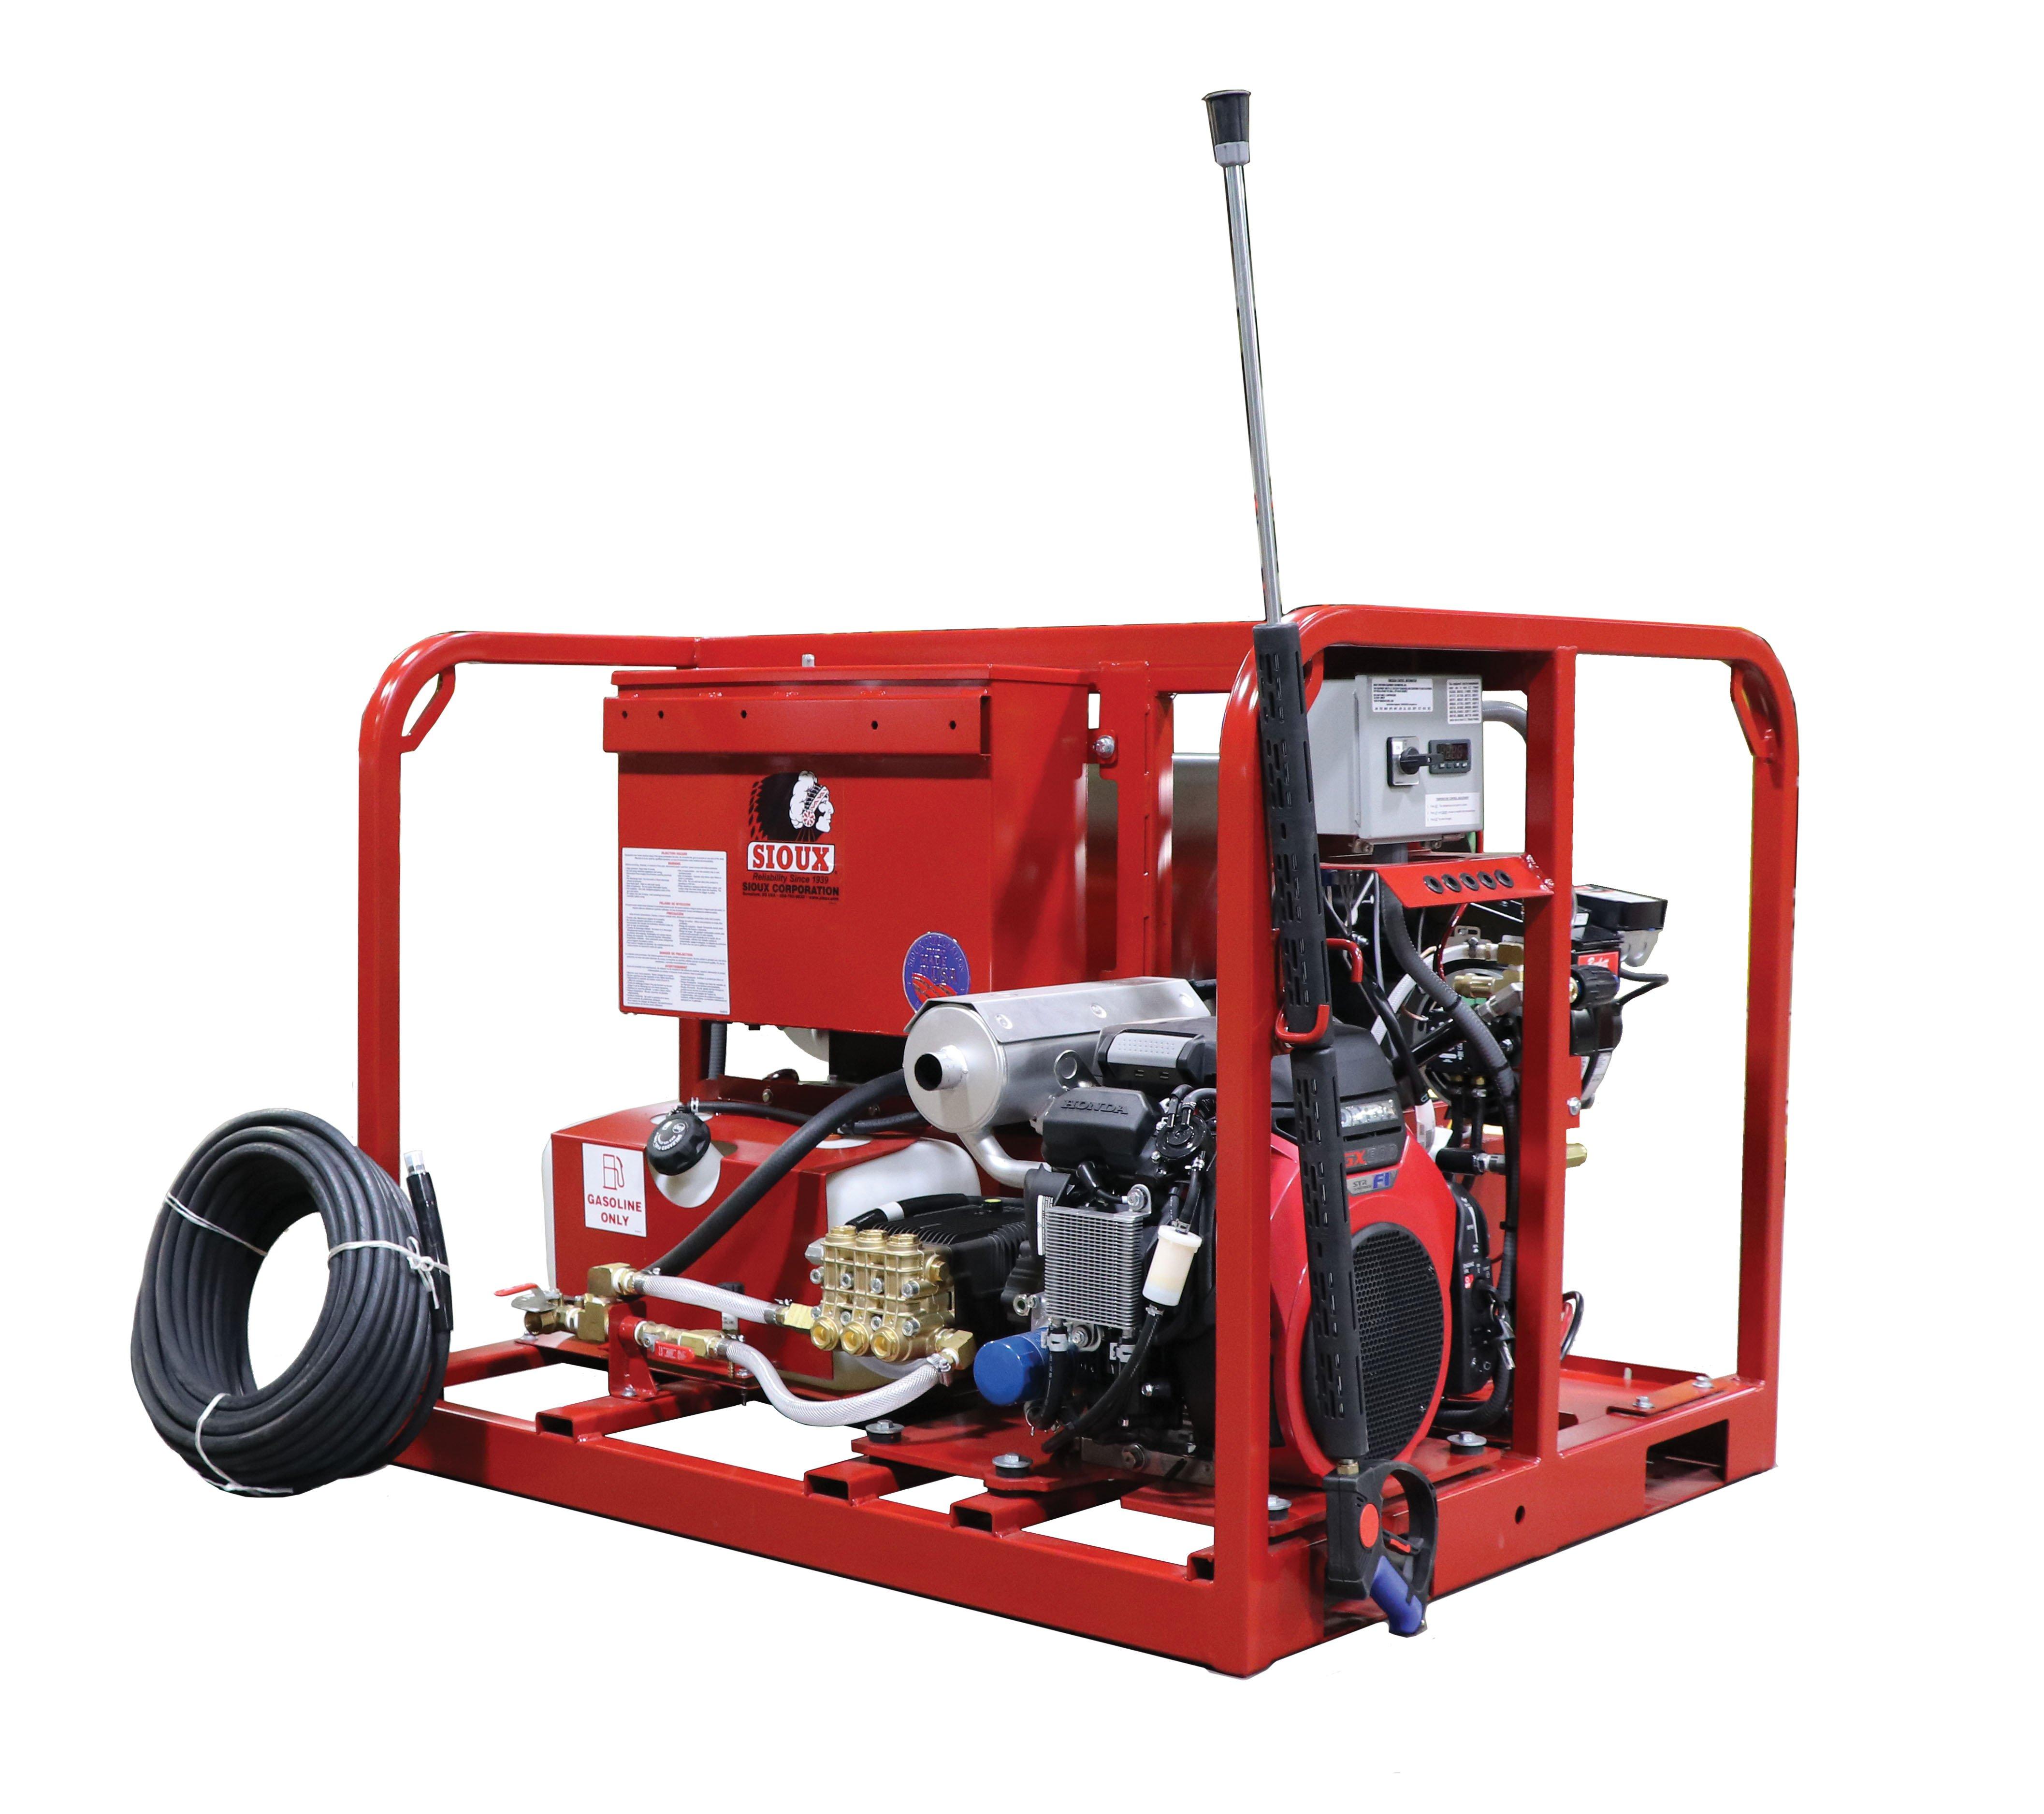 H5.5D3000-G Pressure Washer